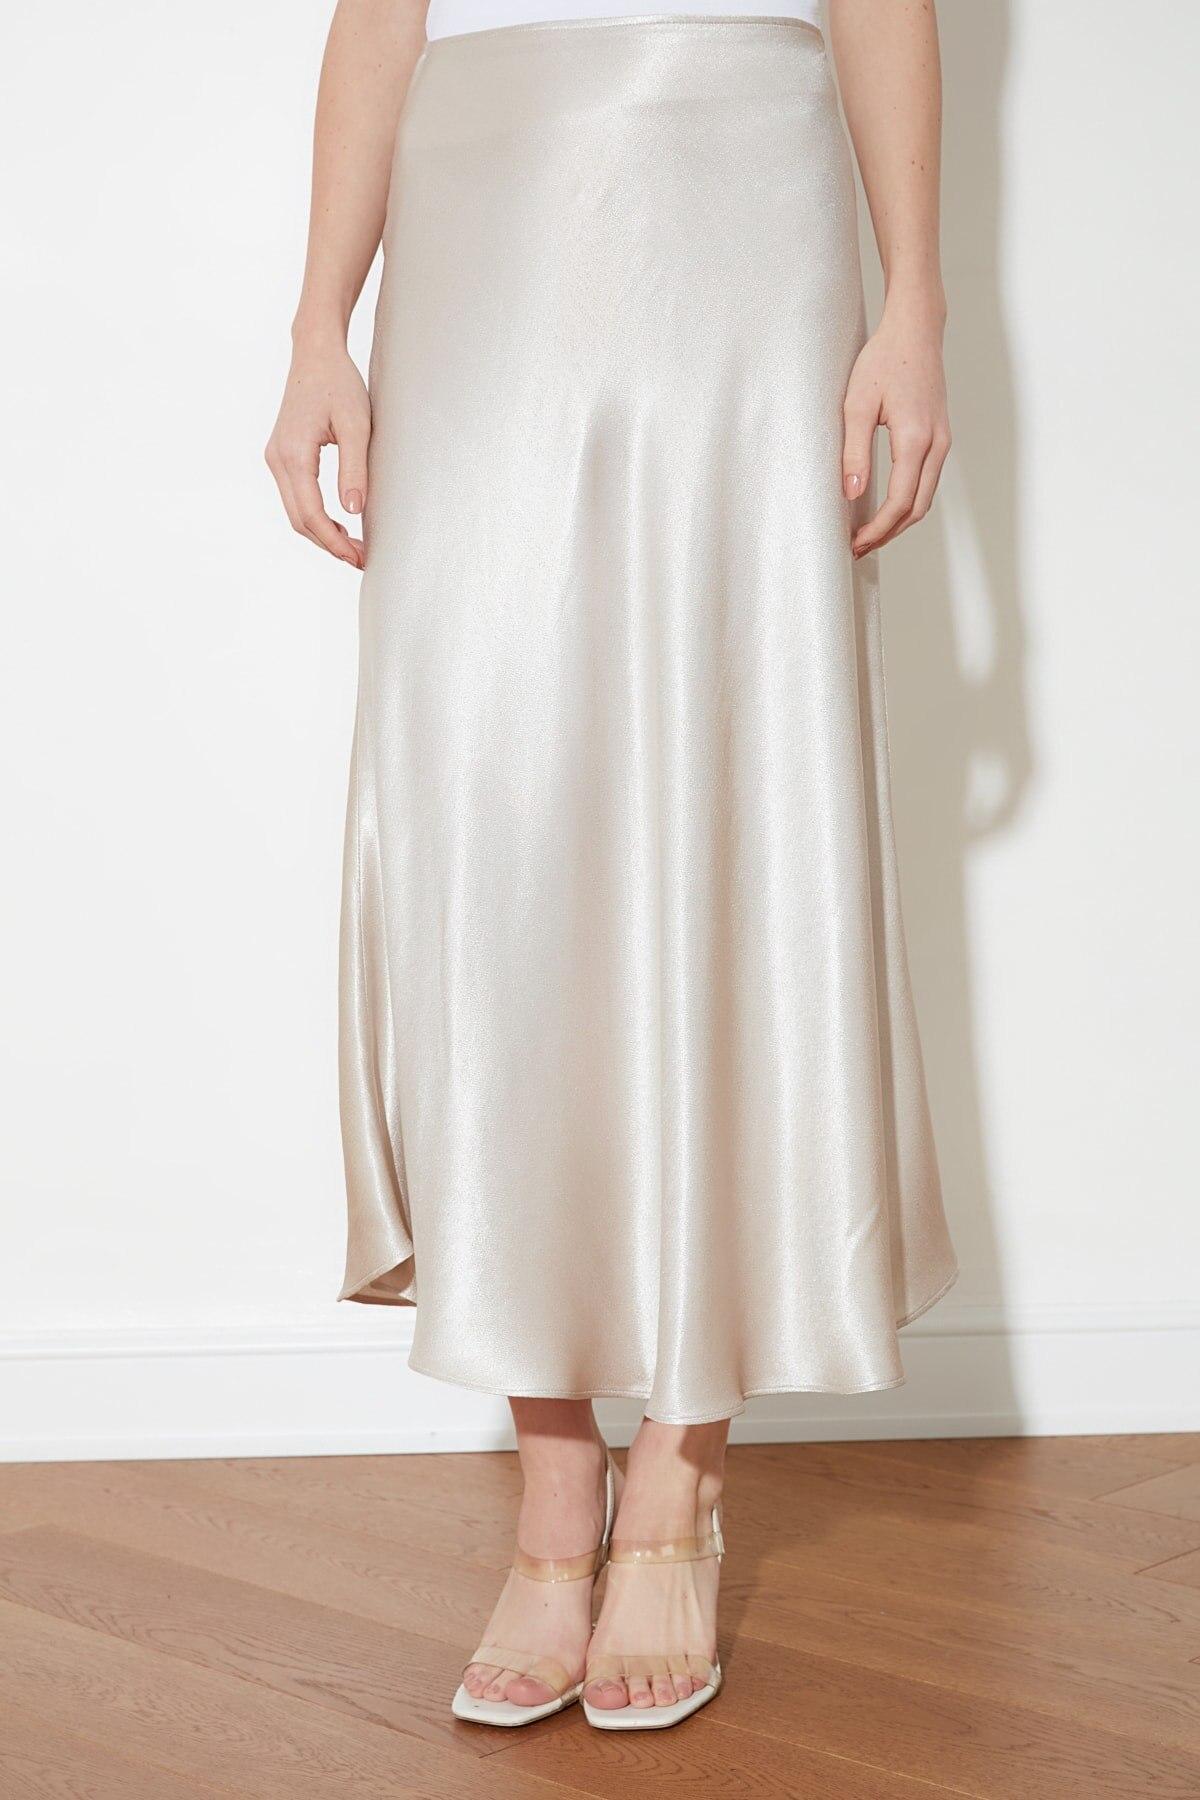 Trendyol Satin Midi Skirt TWOAW21ET0223 юбка faldas юбка с высокой талией faldas largas юбка летняя jupe longue femme 2021 Fashion